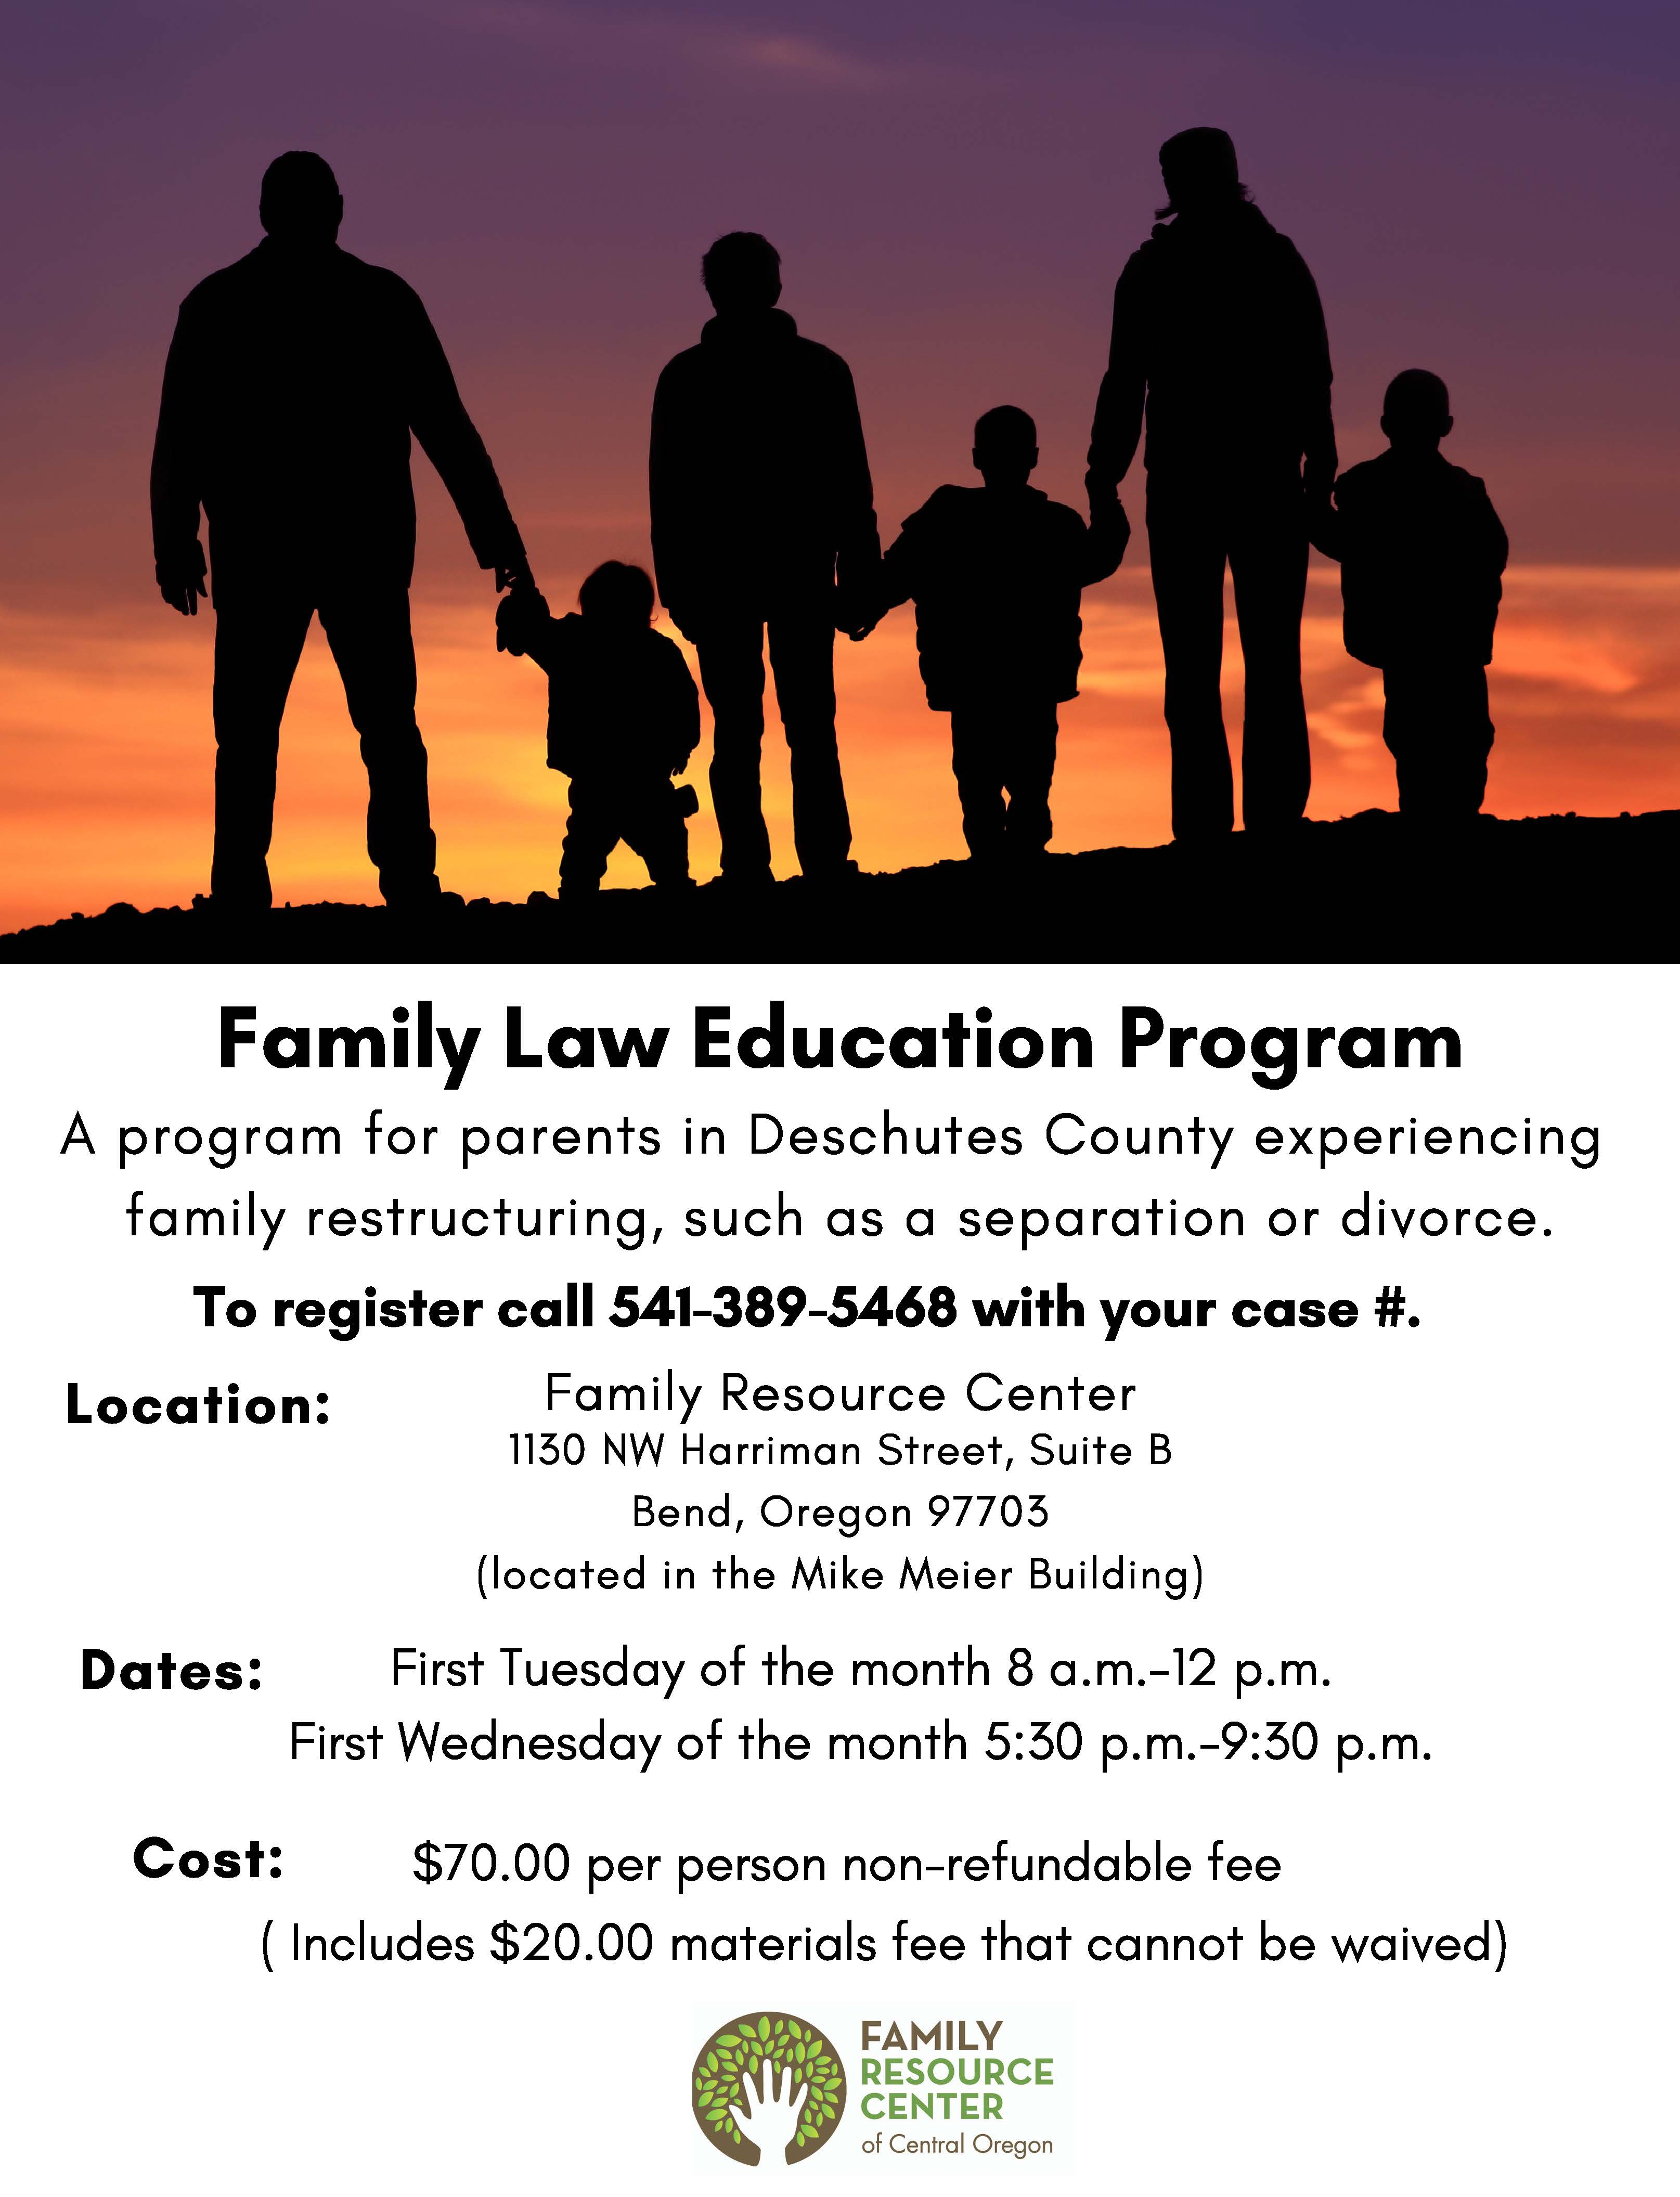 Family Law Education Program